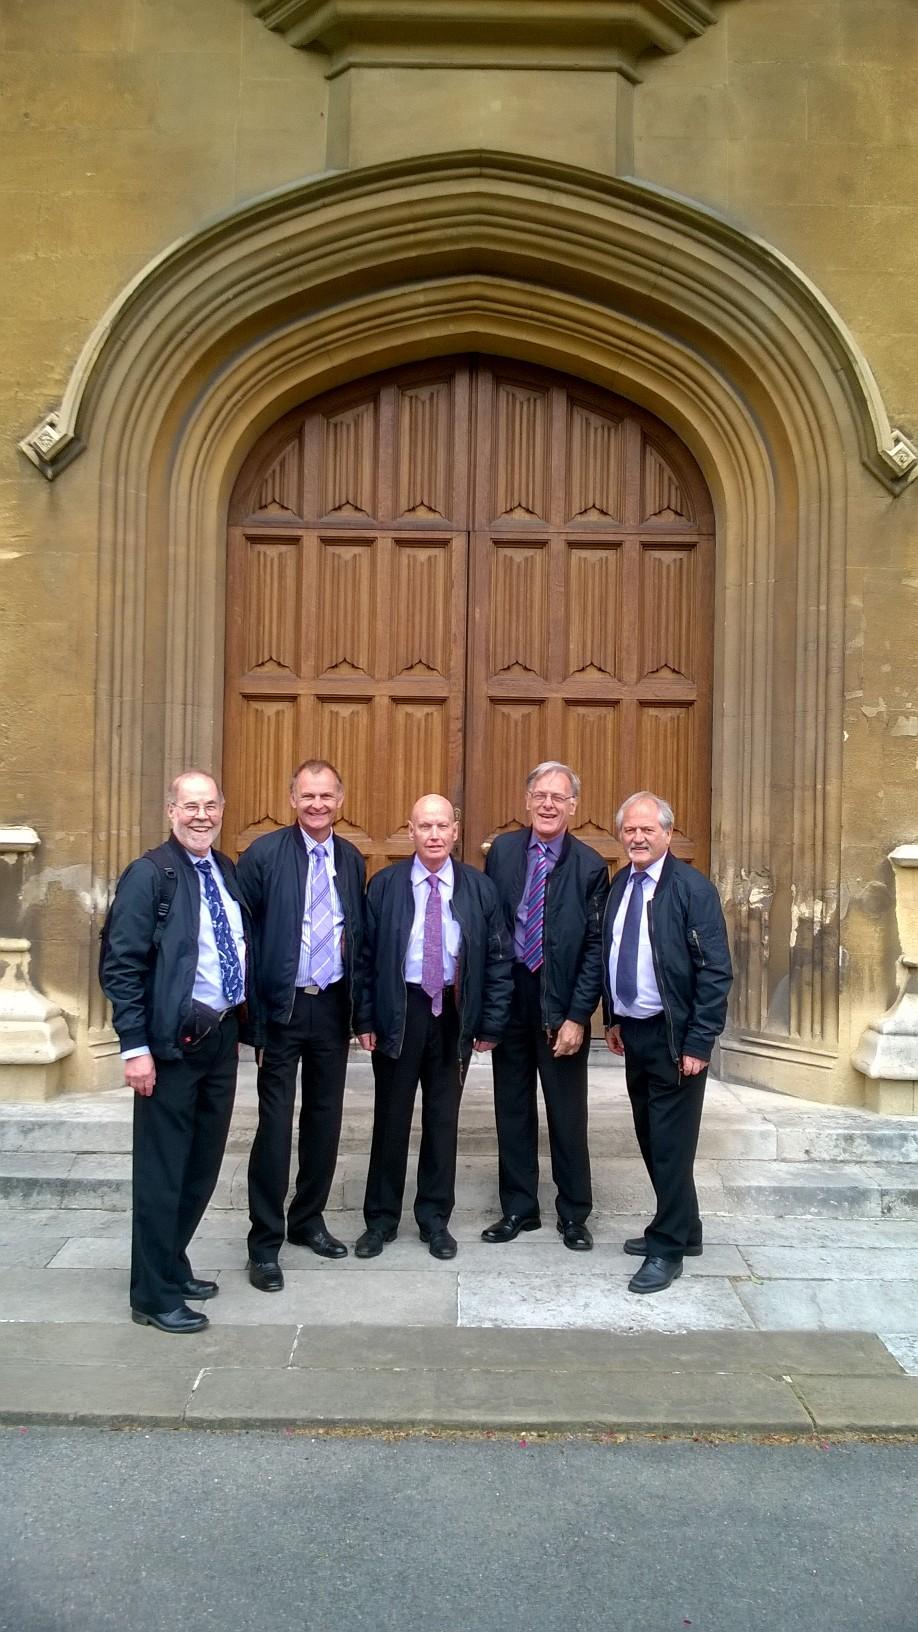 Quintessence outside Lambeth Palace